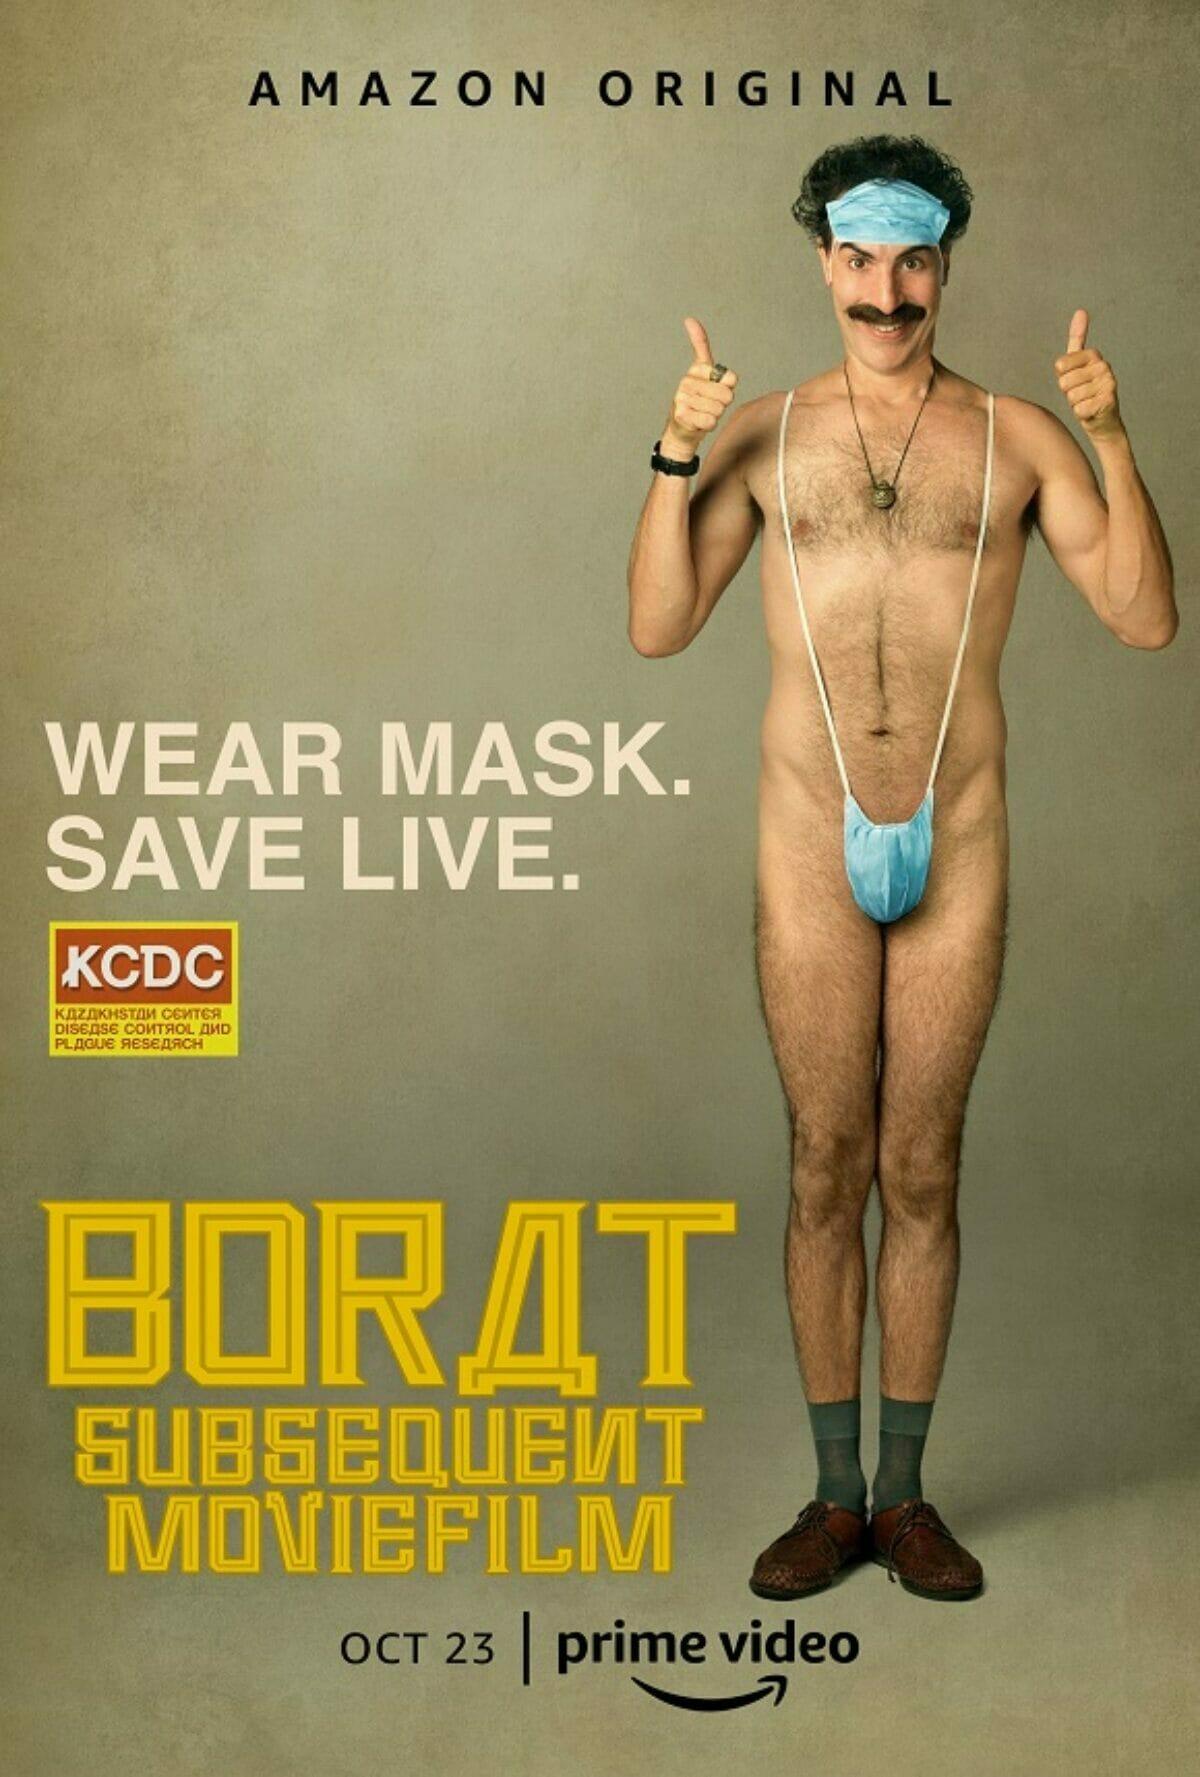 borat-2-poster-scaled